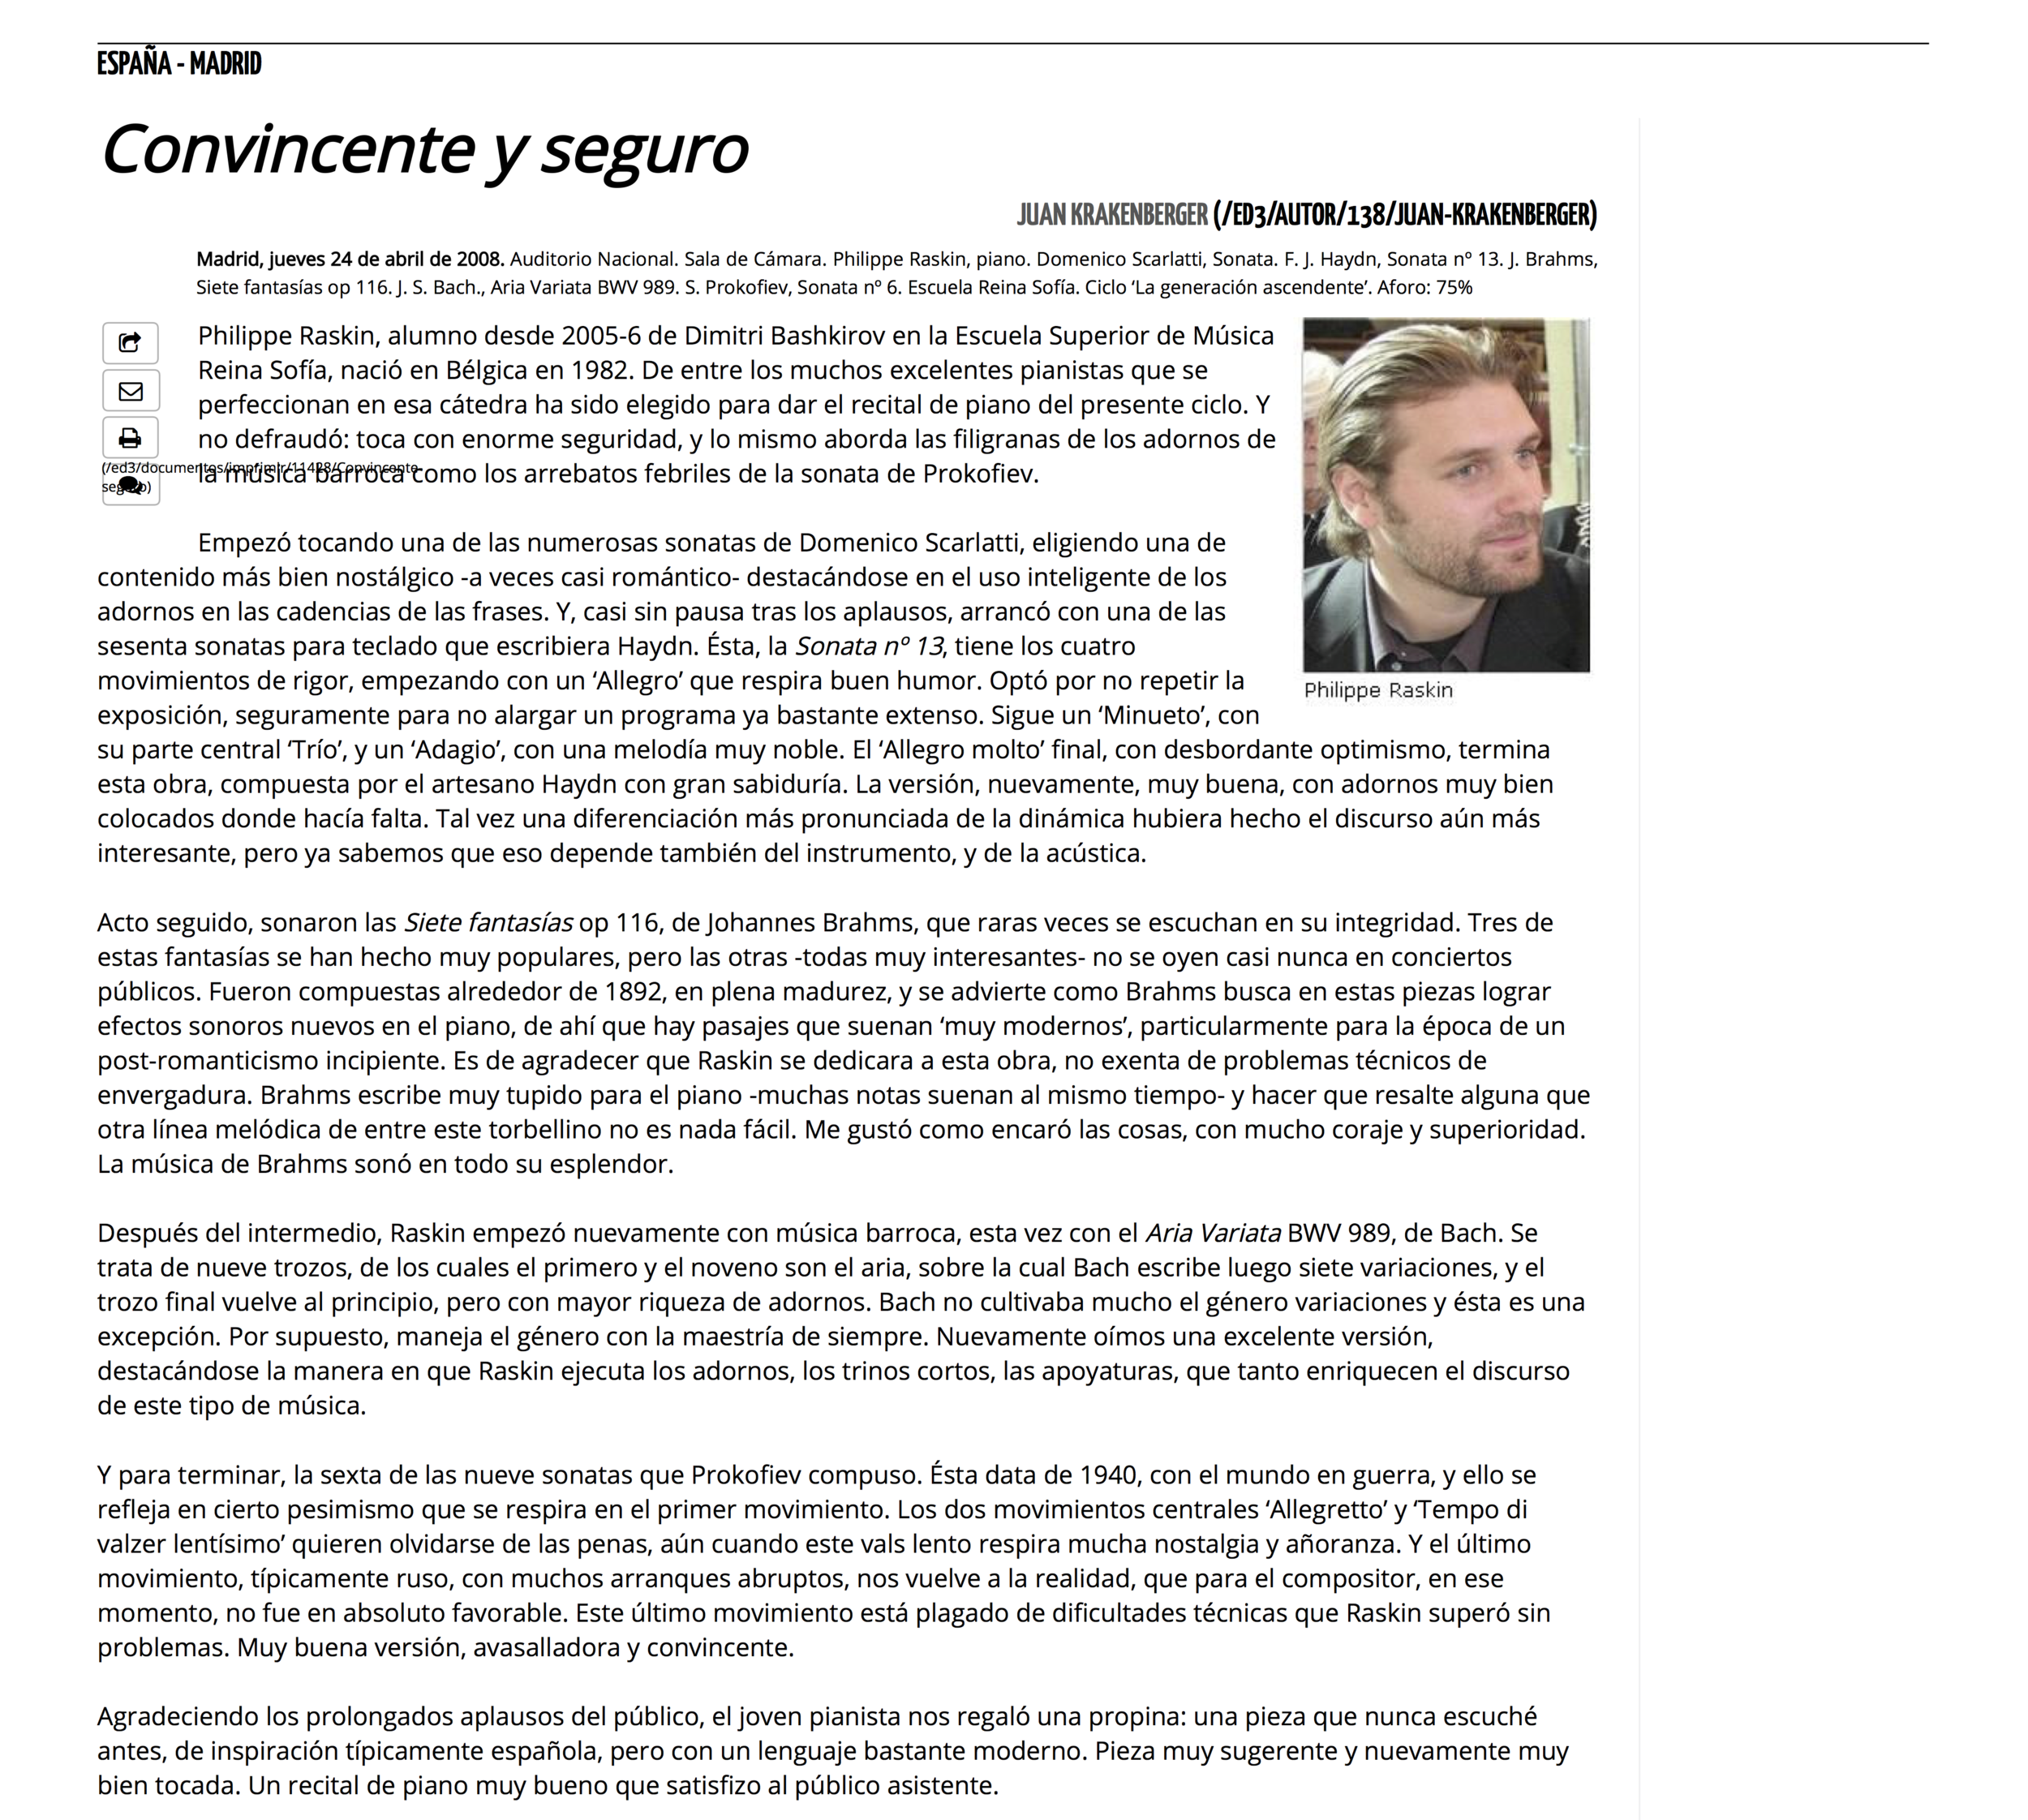 El Mundo Clasico 2008.png